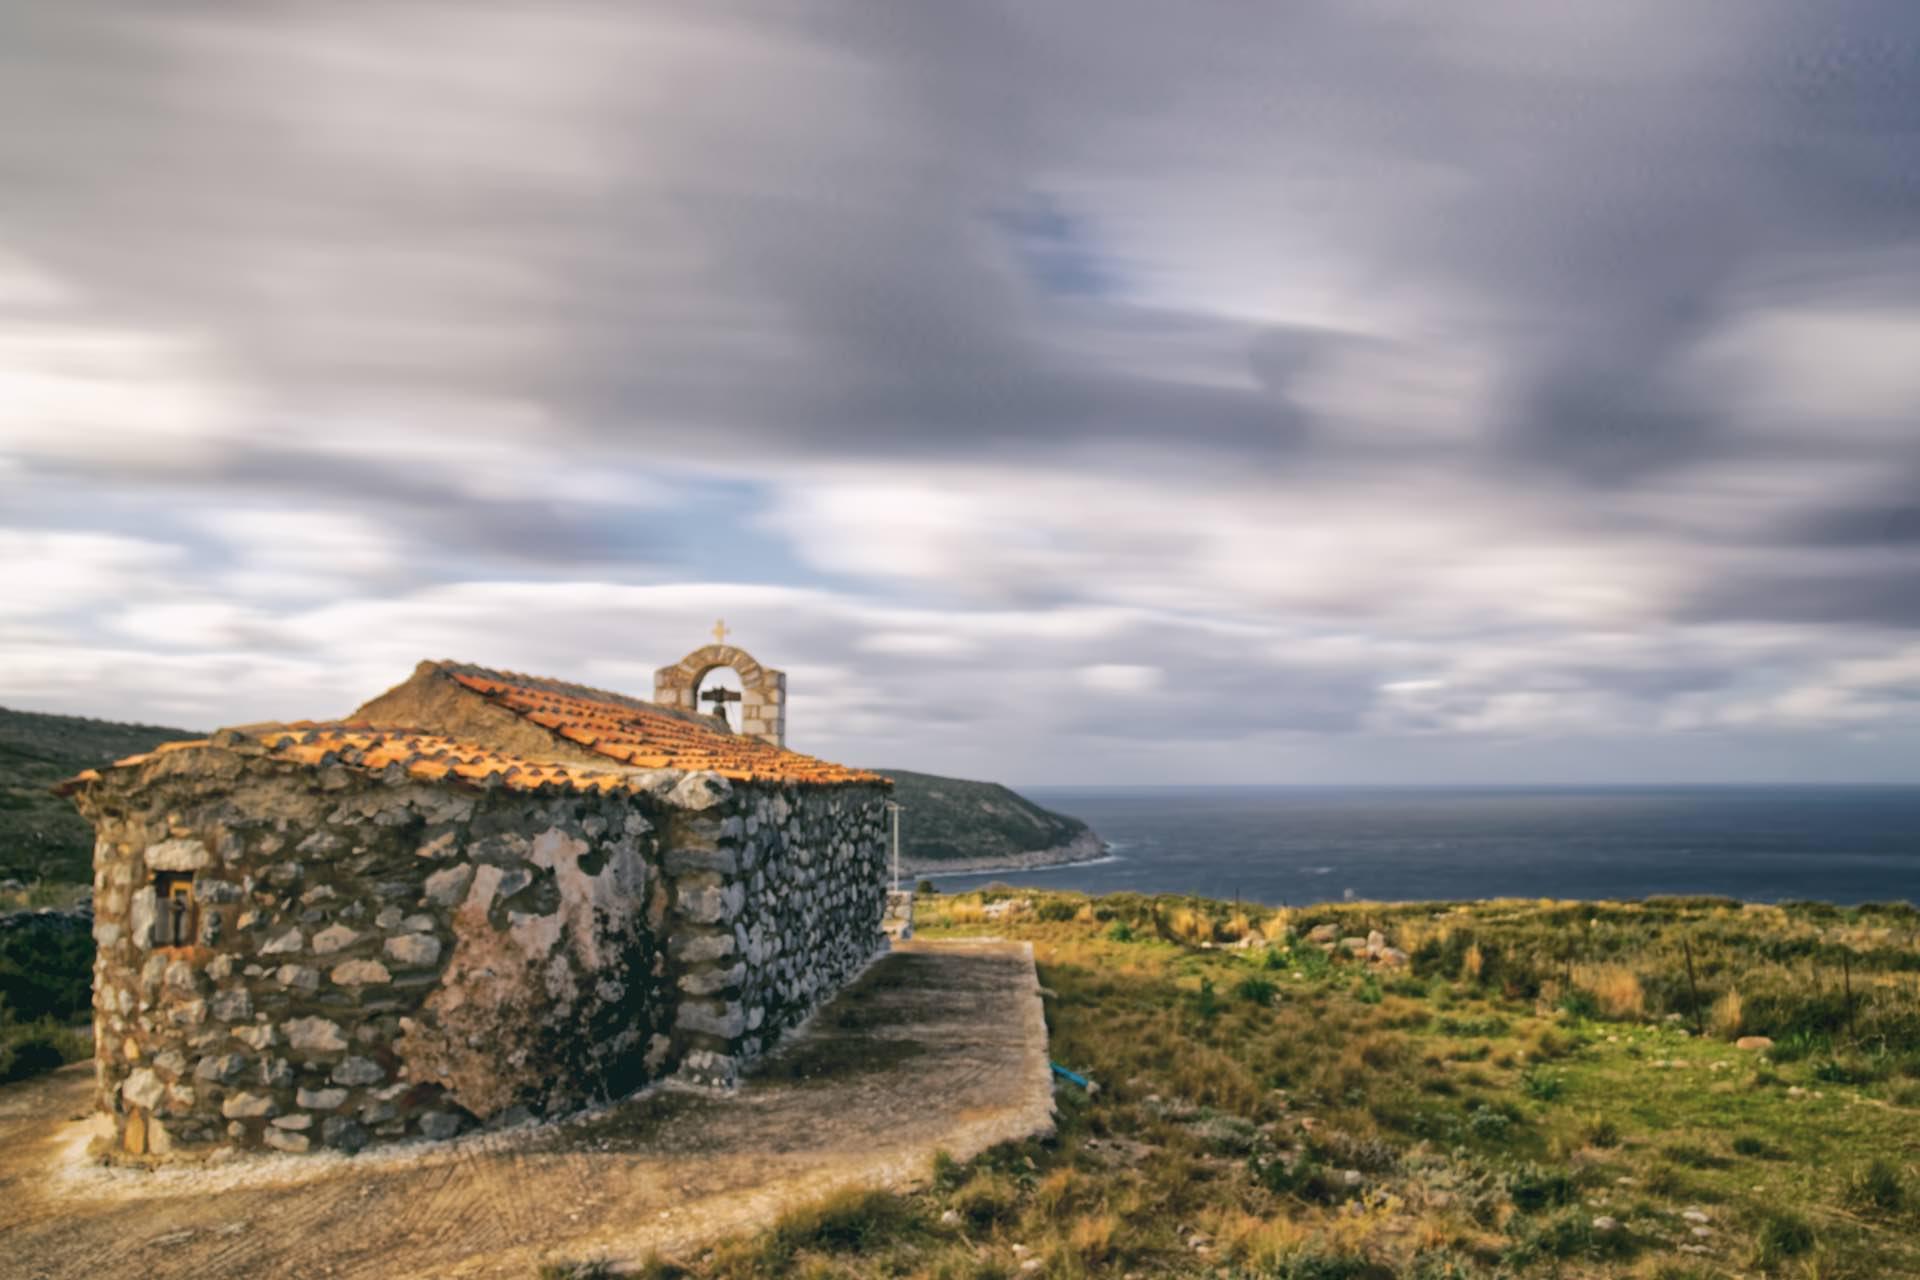 Church Overlooking the Sea